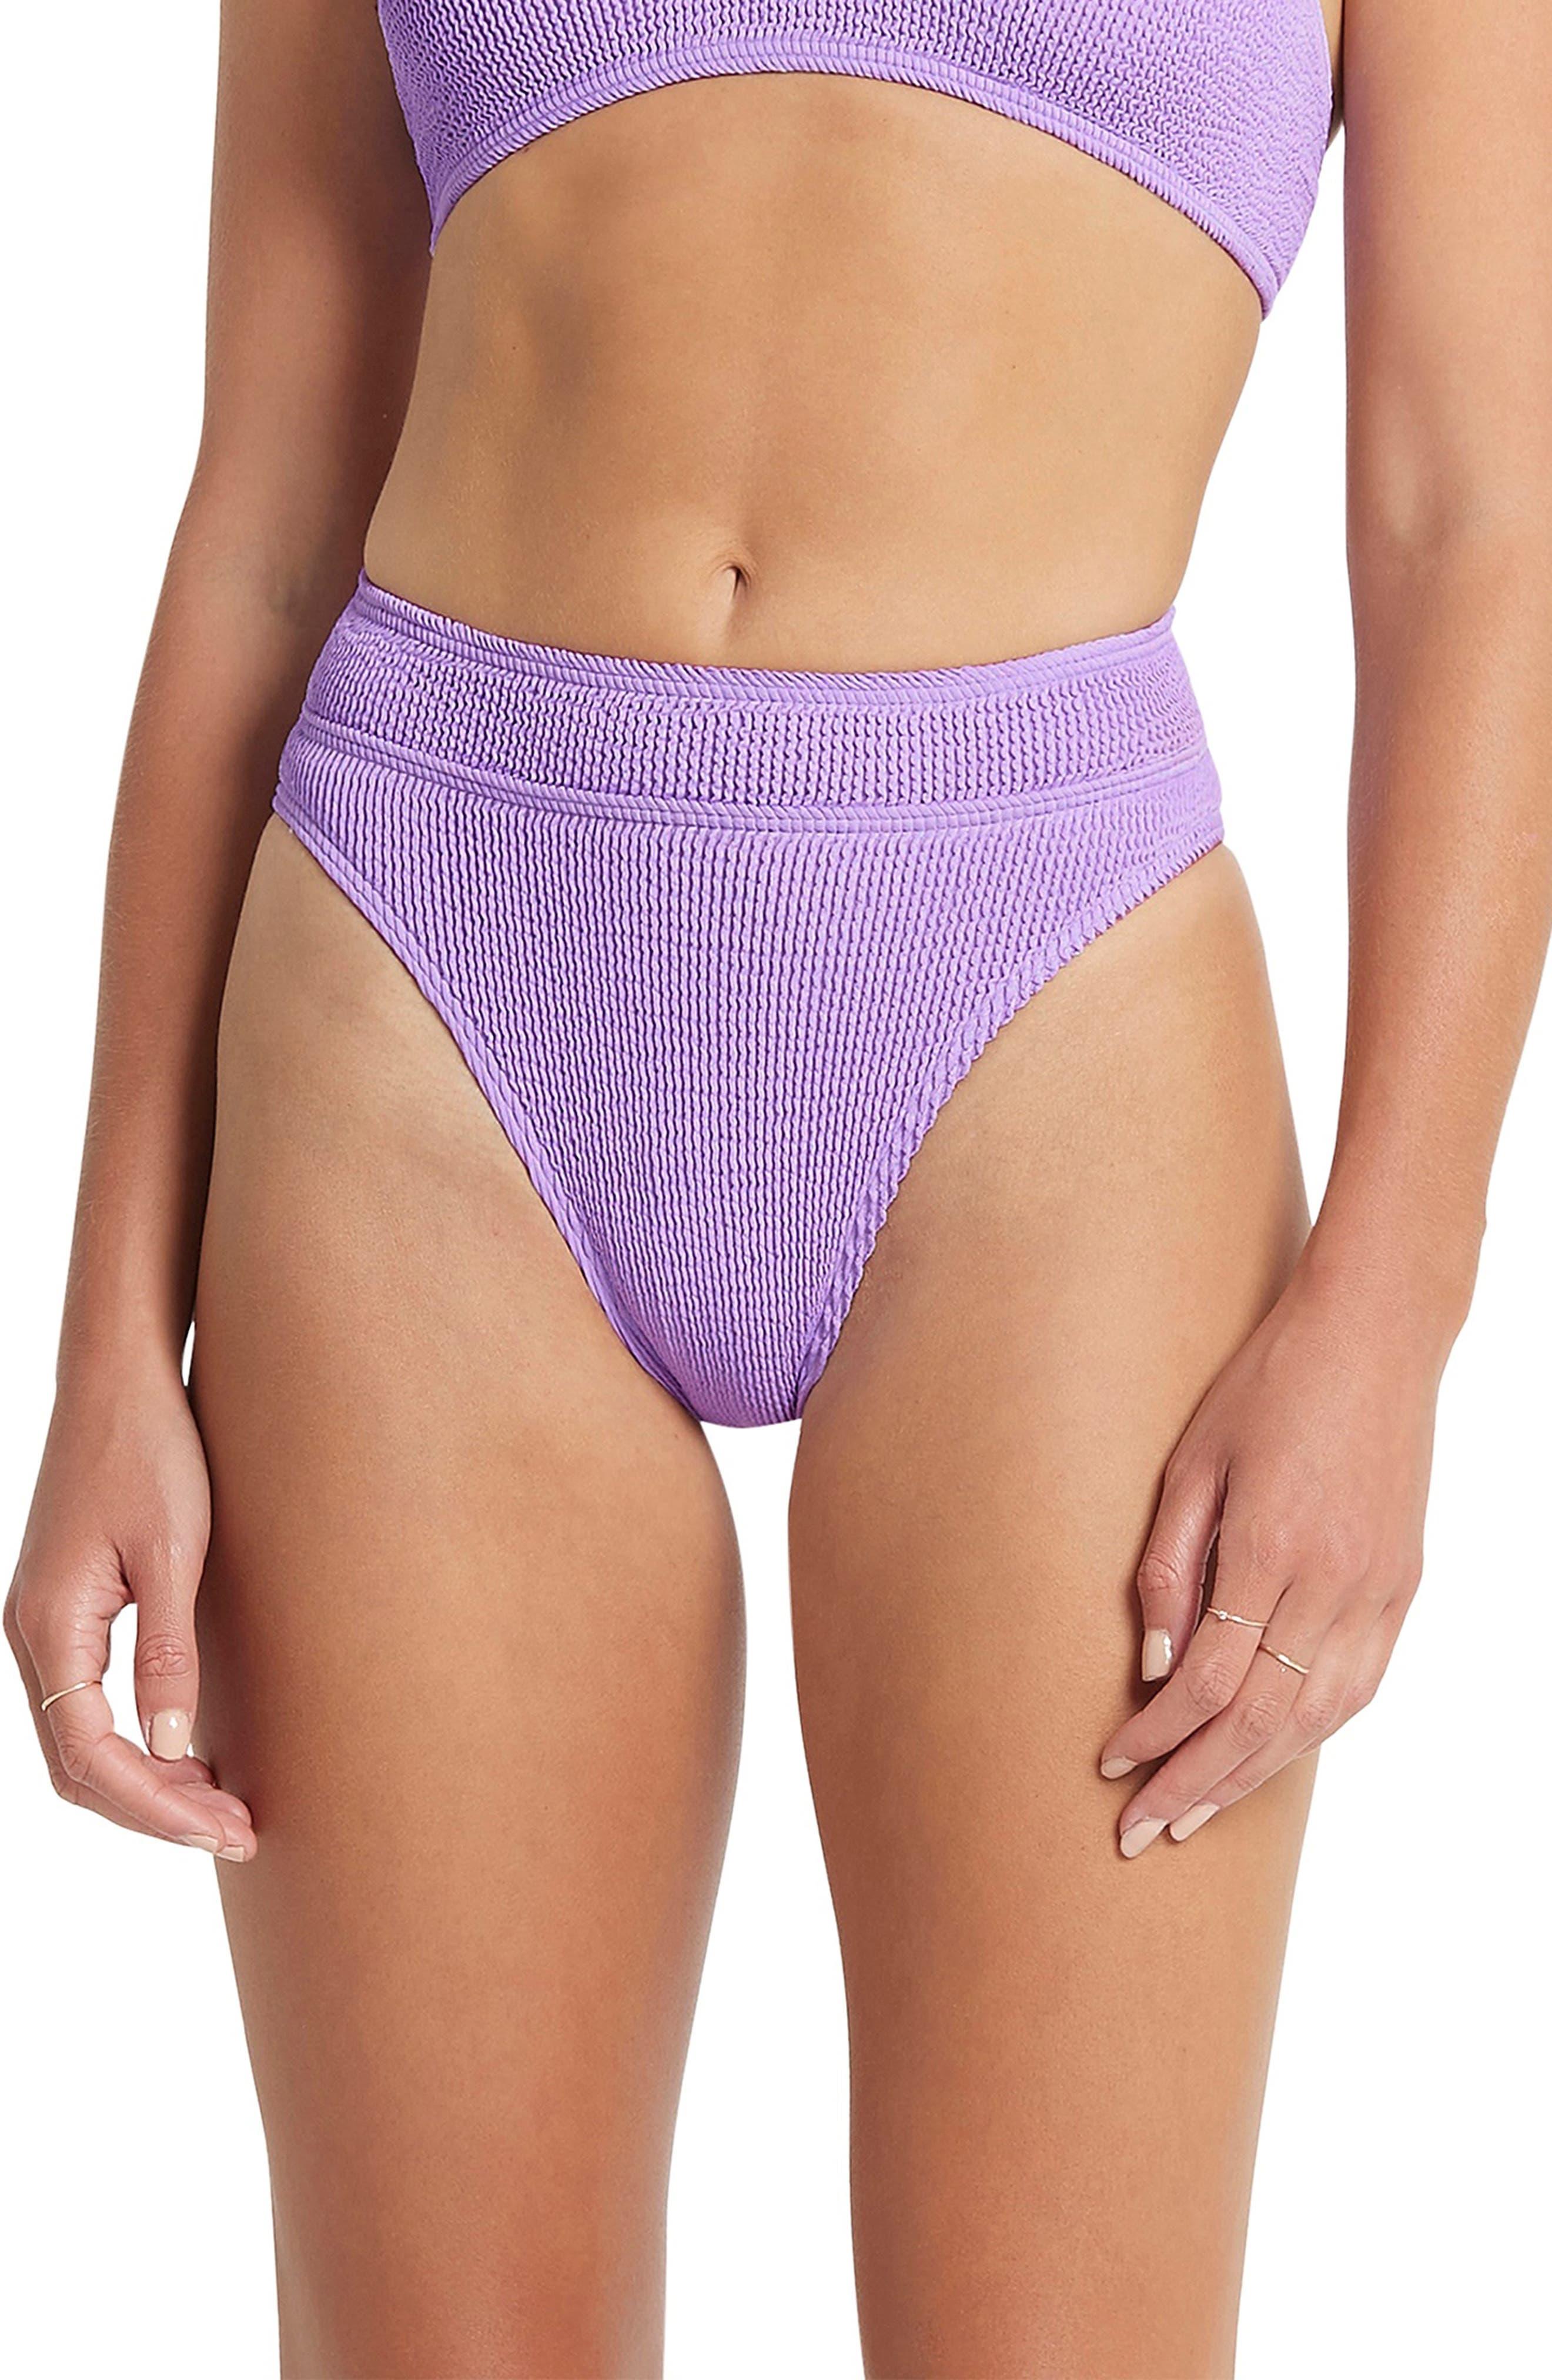 The Savannah High-Waist Ribbed Bikini Bottoms